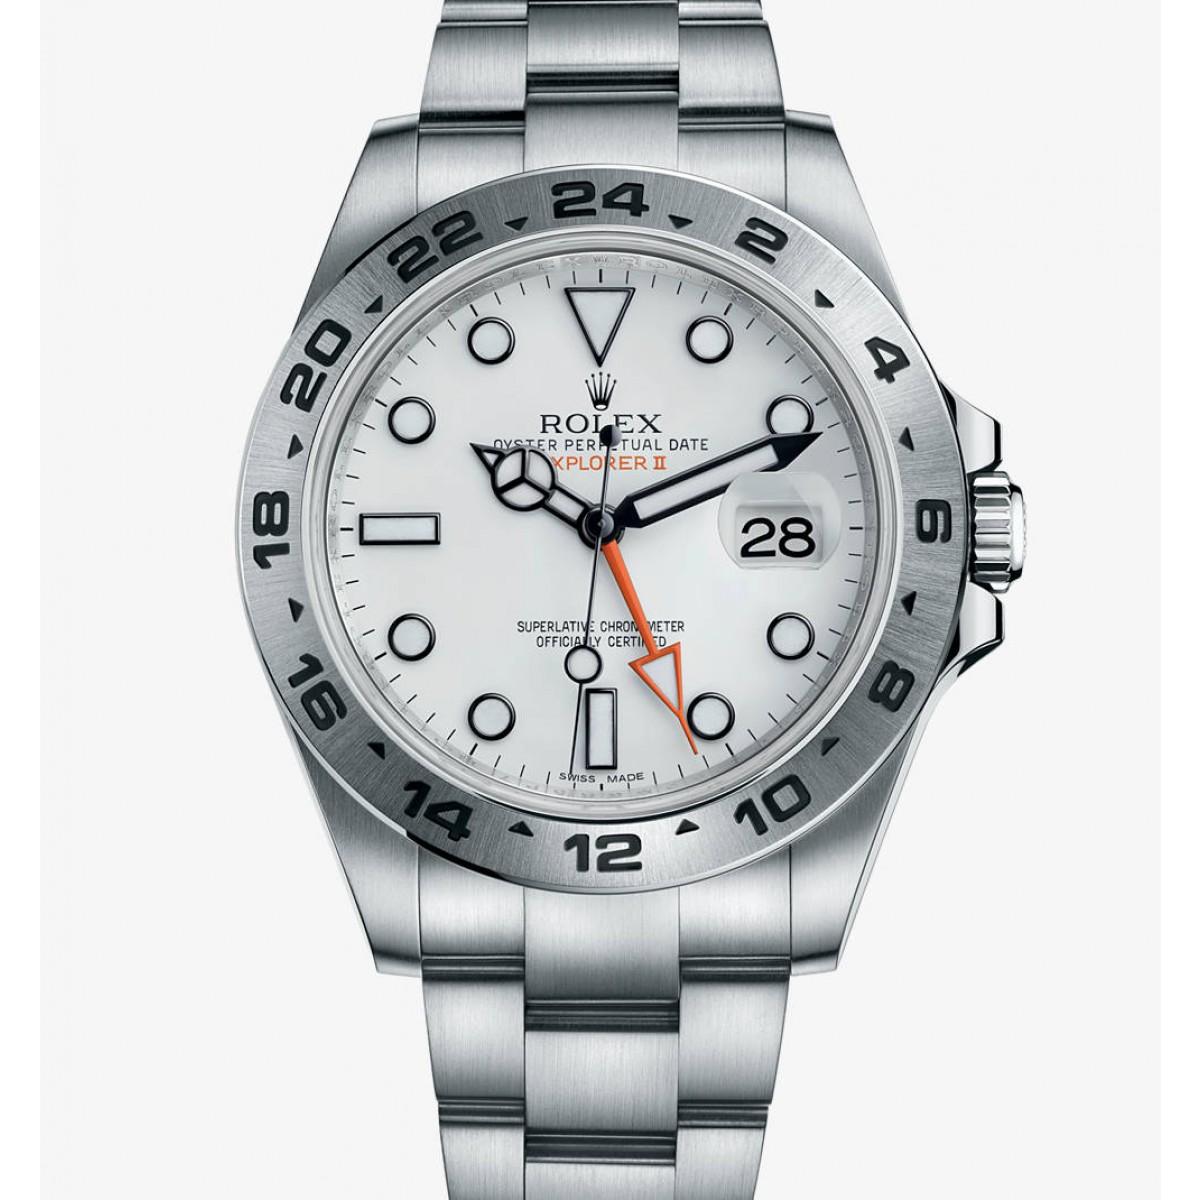 2f28f206341 Relógio Réplica Rolex Explorer ll Orange